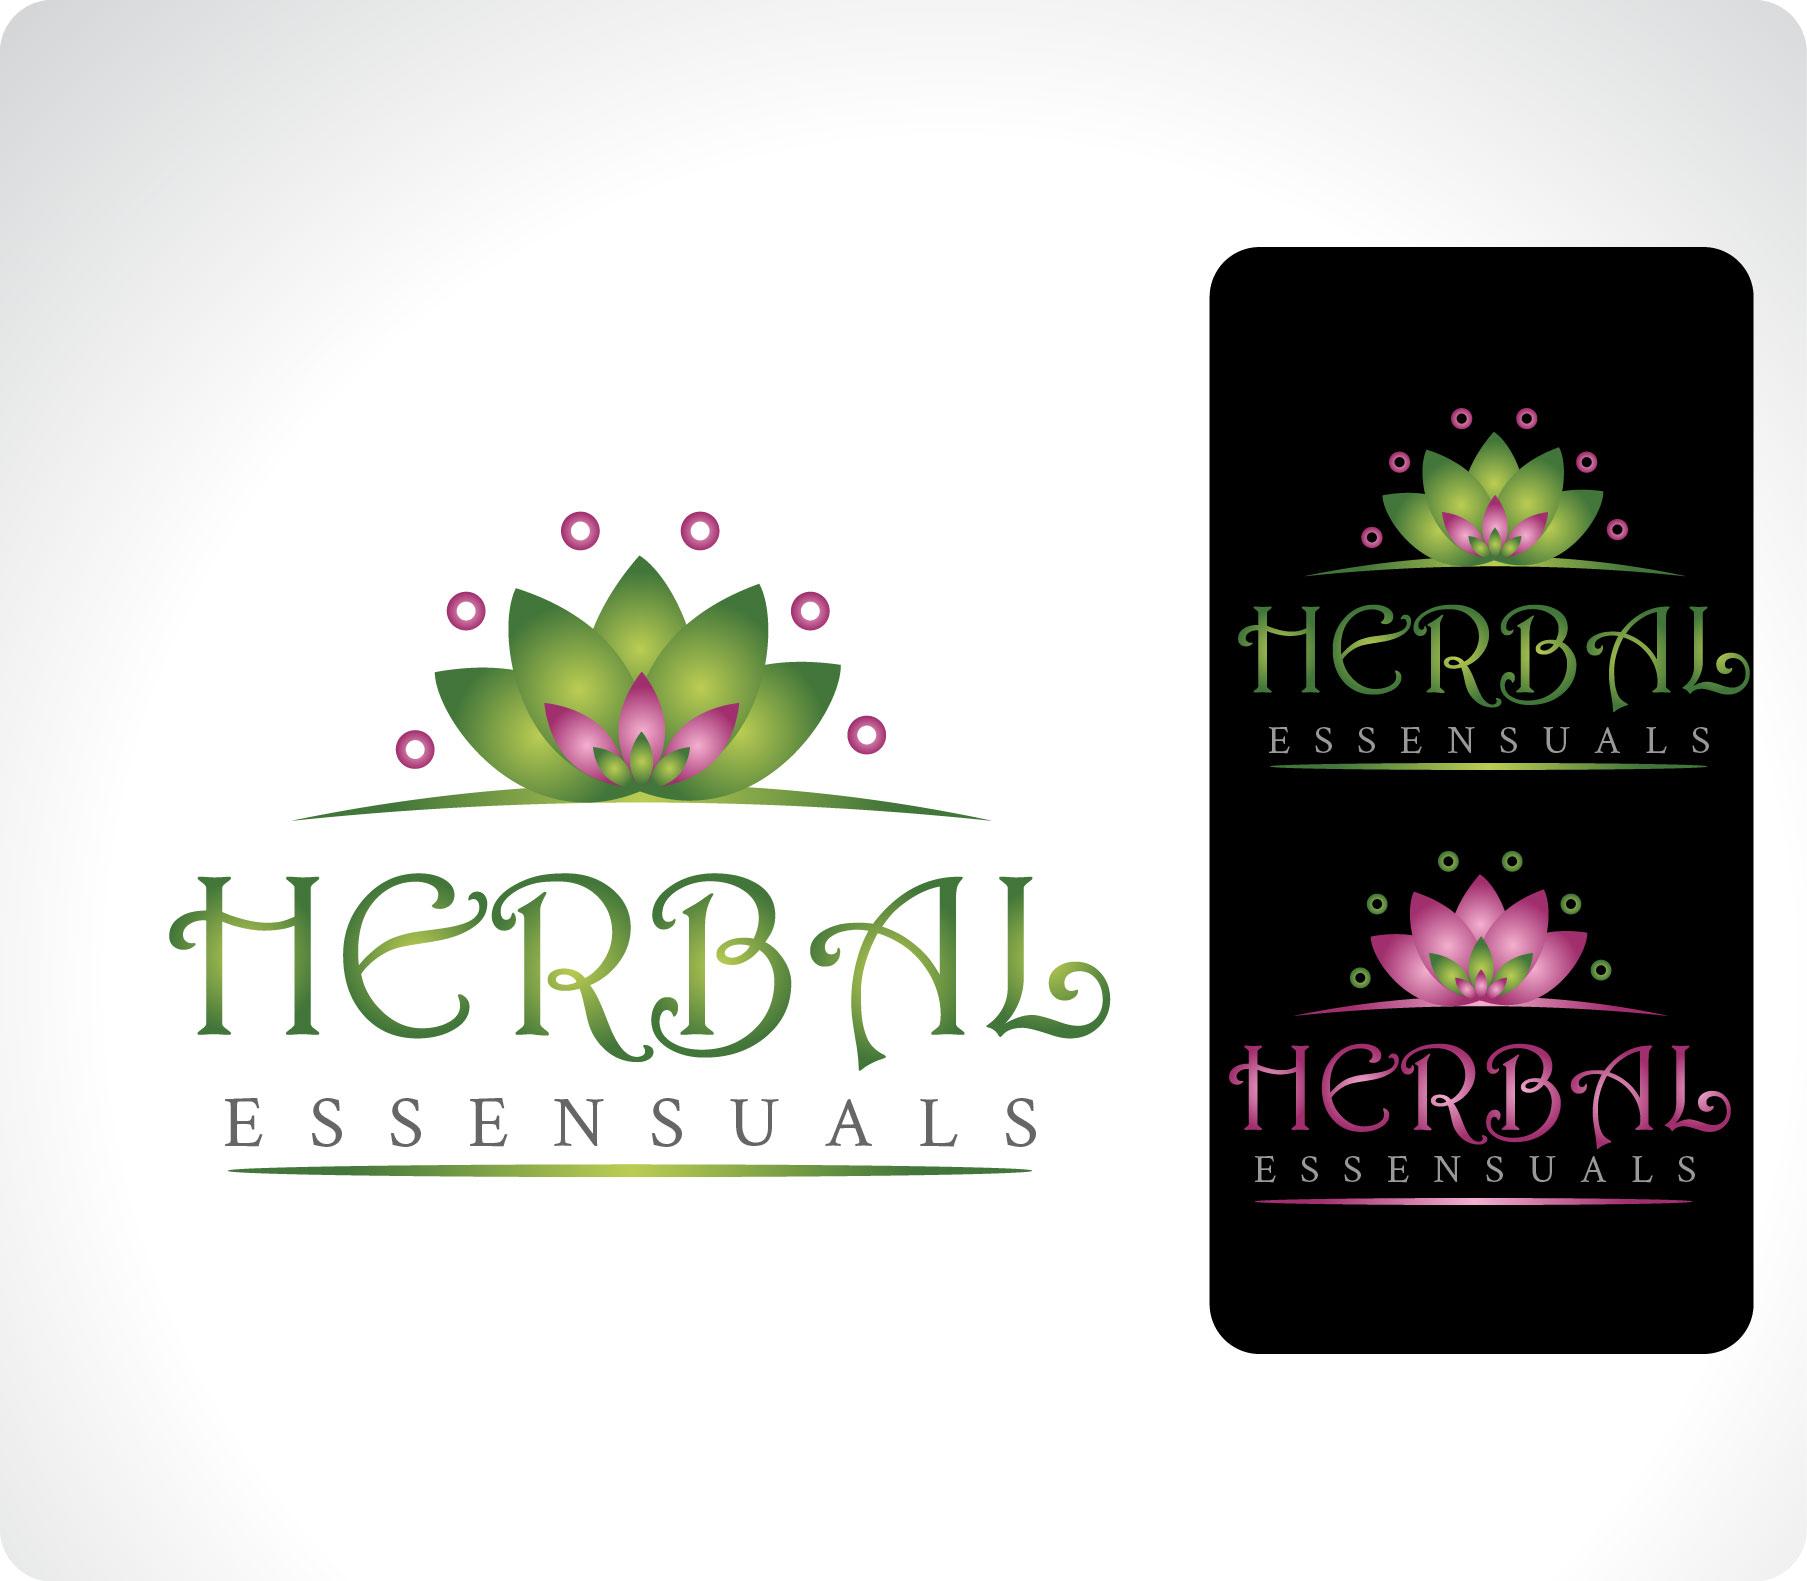 Logo Design by Darina Dimitrova - Entry No. 109 in the Logo Design Contest Captivating Logo Design for Herbal Essensuals.